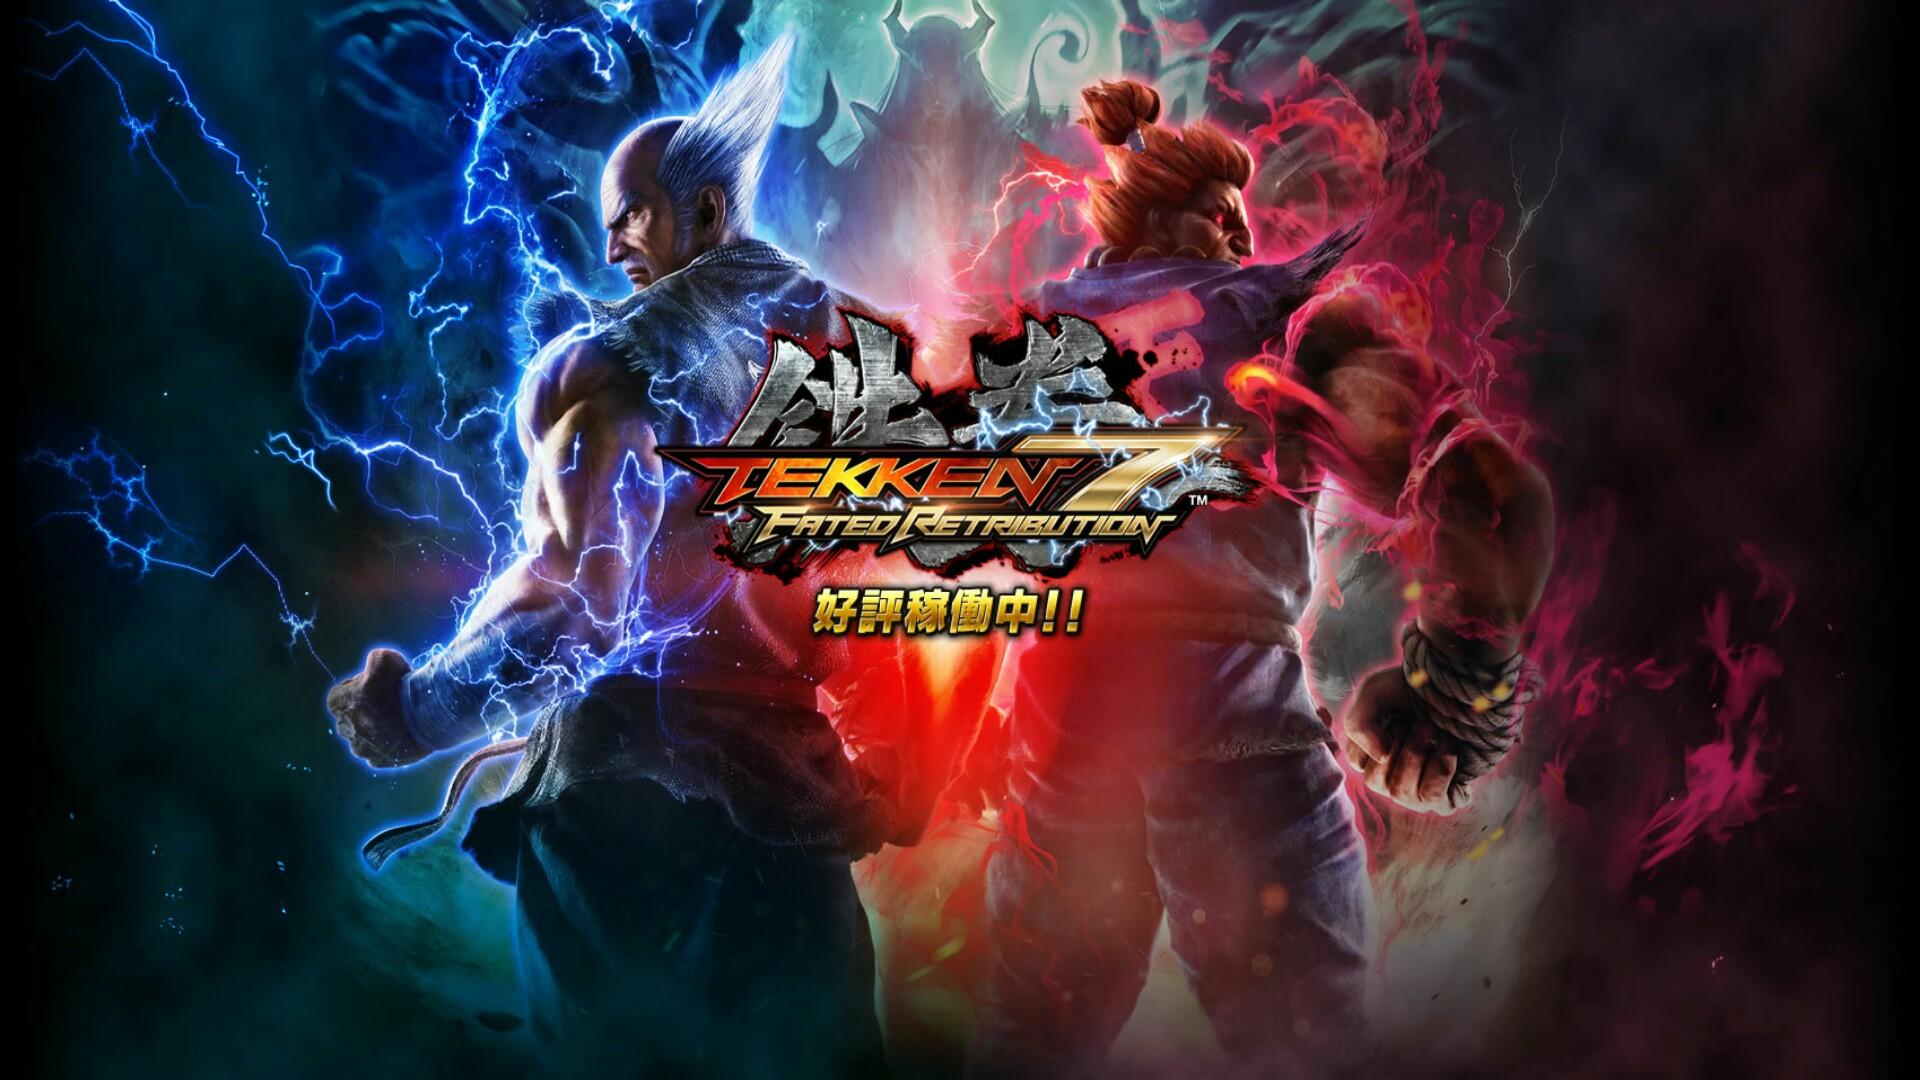 Tekken 7 Heihachi Akuma Ps4wallpapers Com